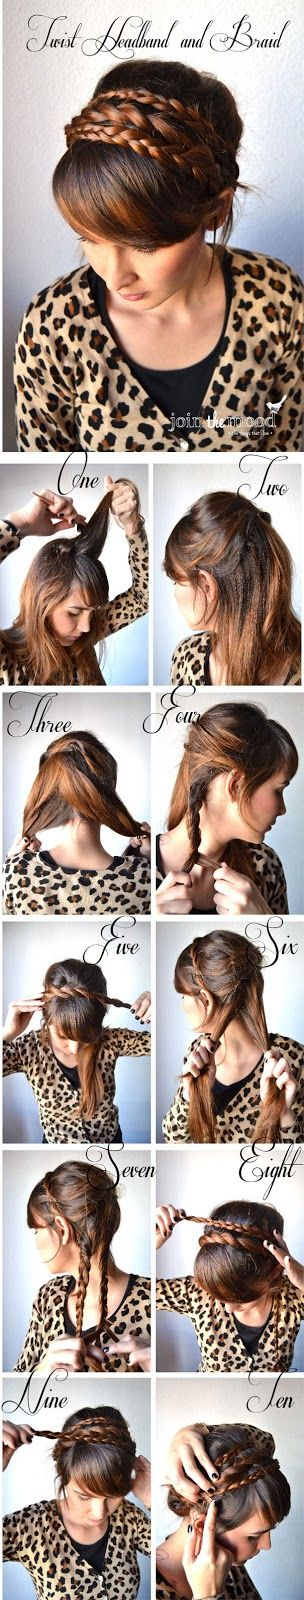 Make Headband And Braid | hairstyles tutorial